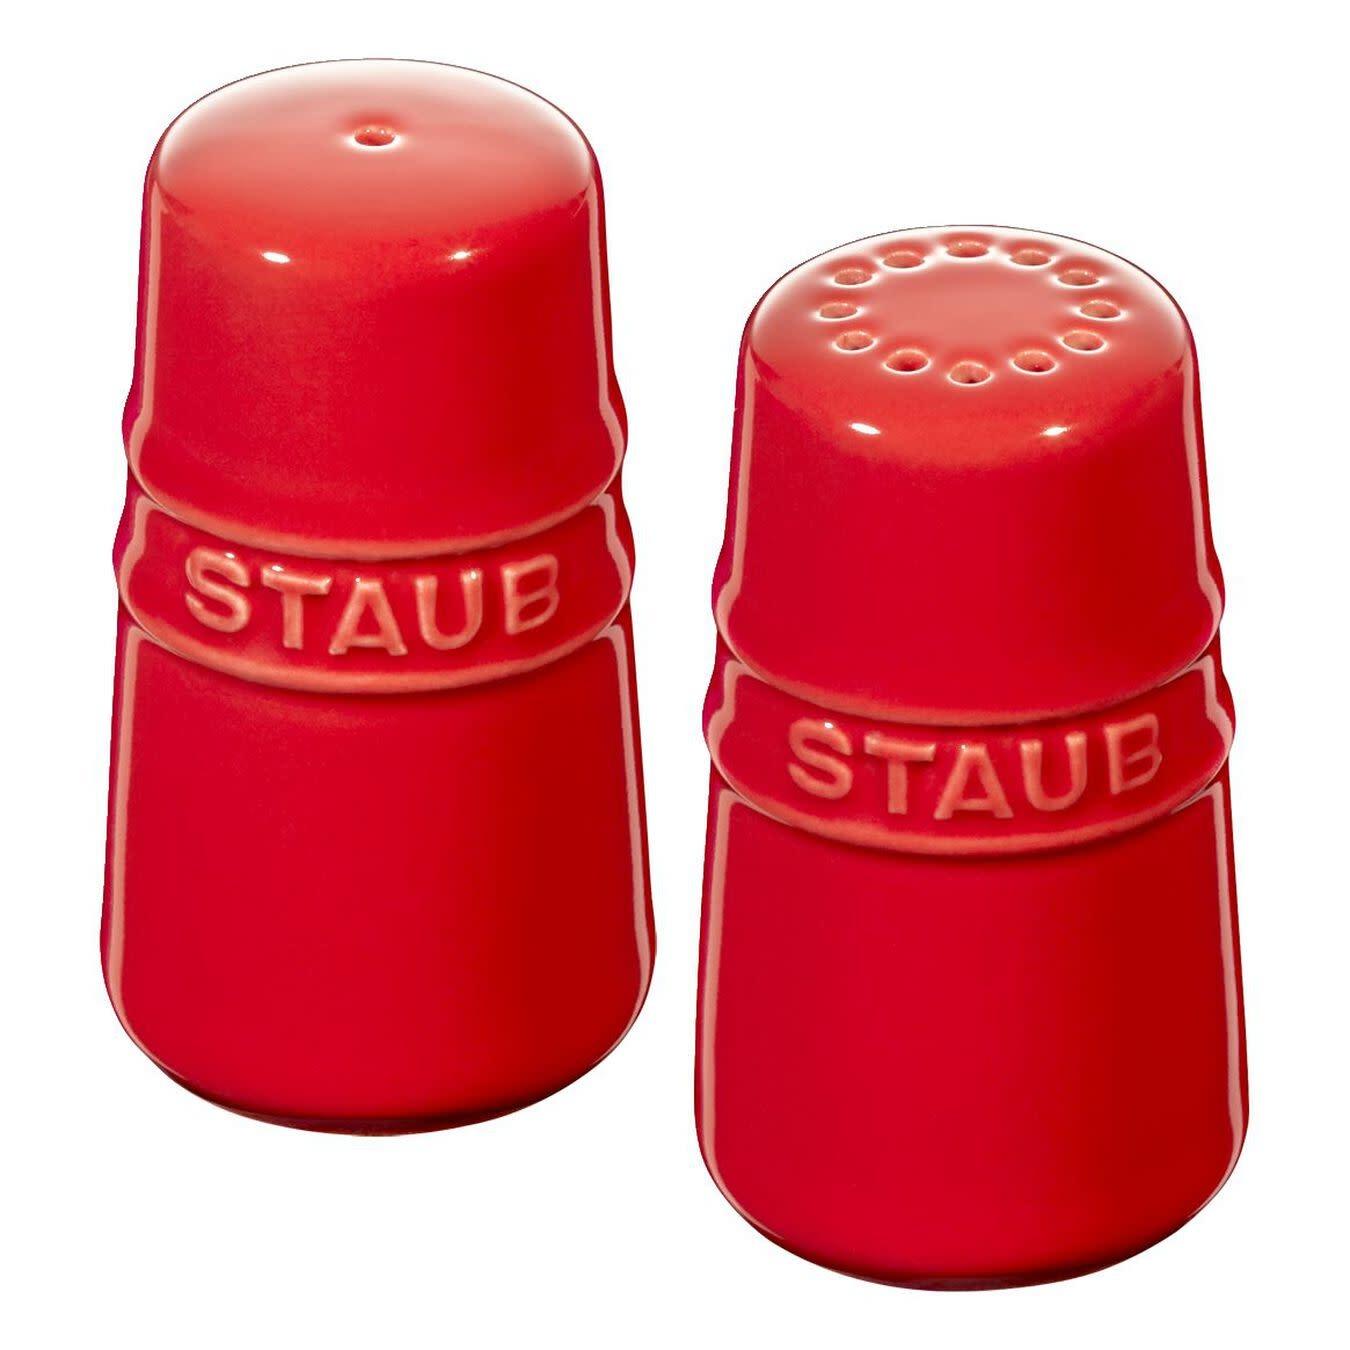 "Staub Salt & Pepper Shakers 7cm / 2.8"" Cherry"